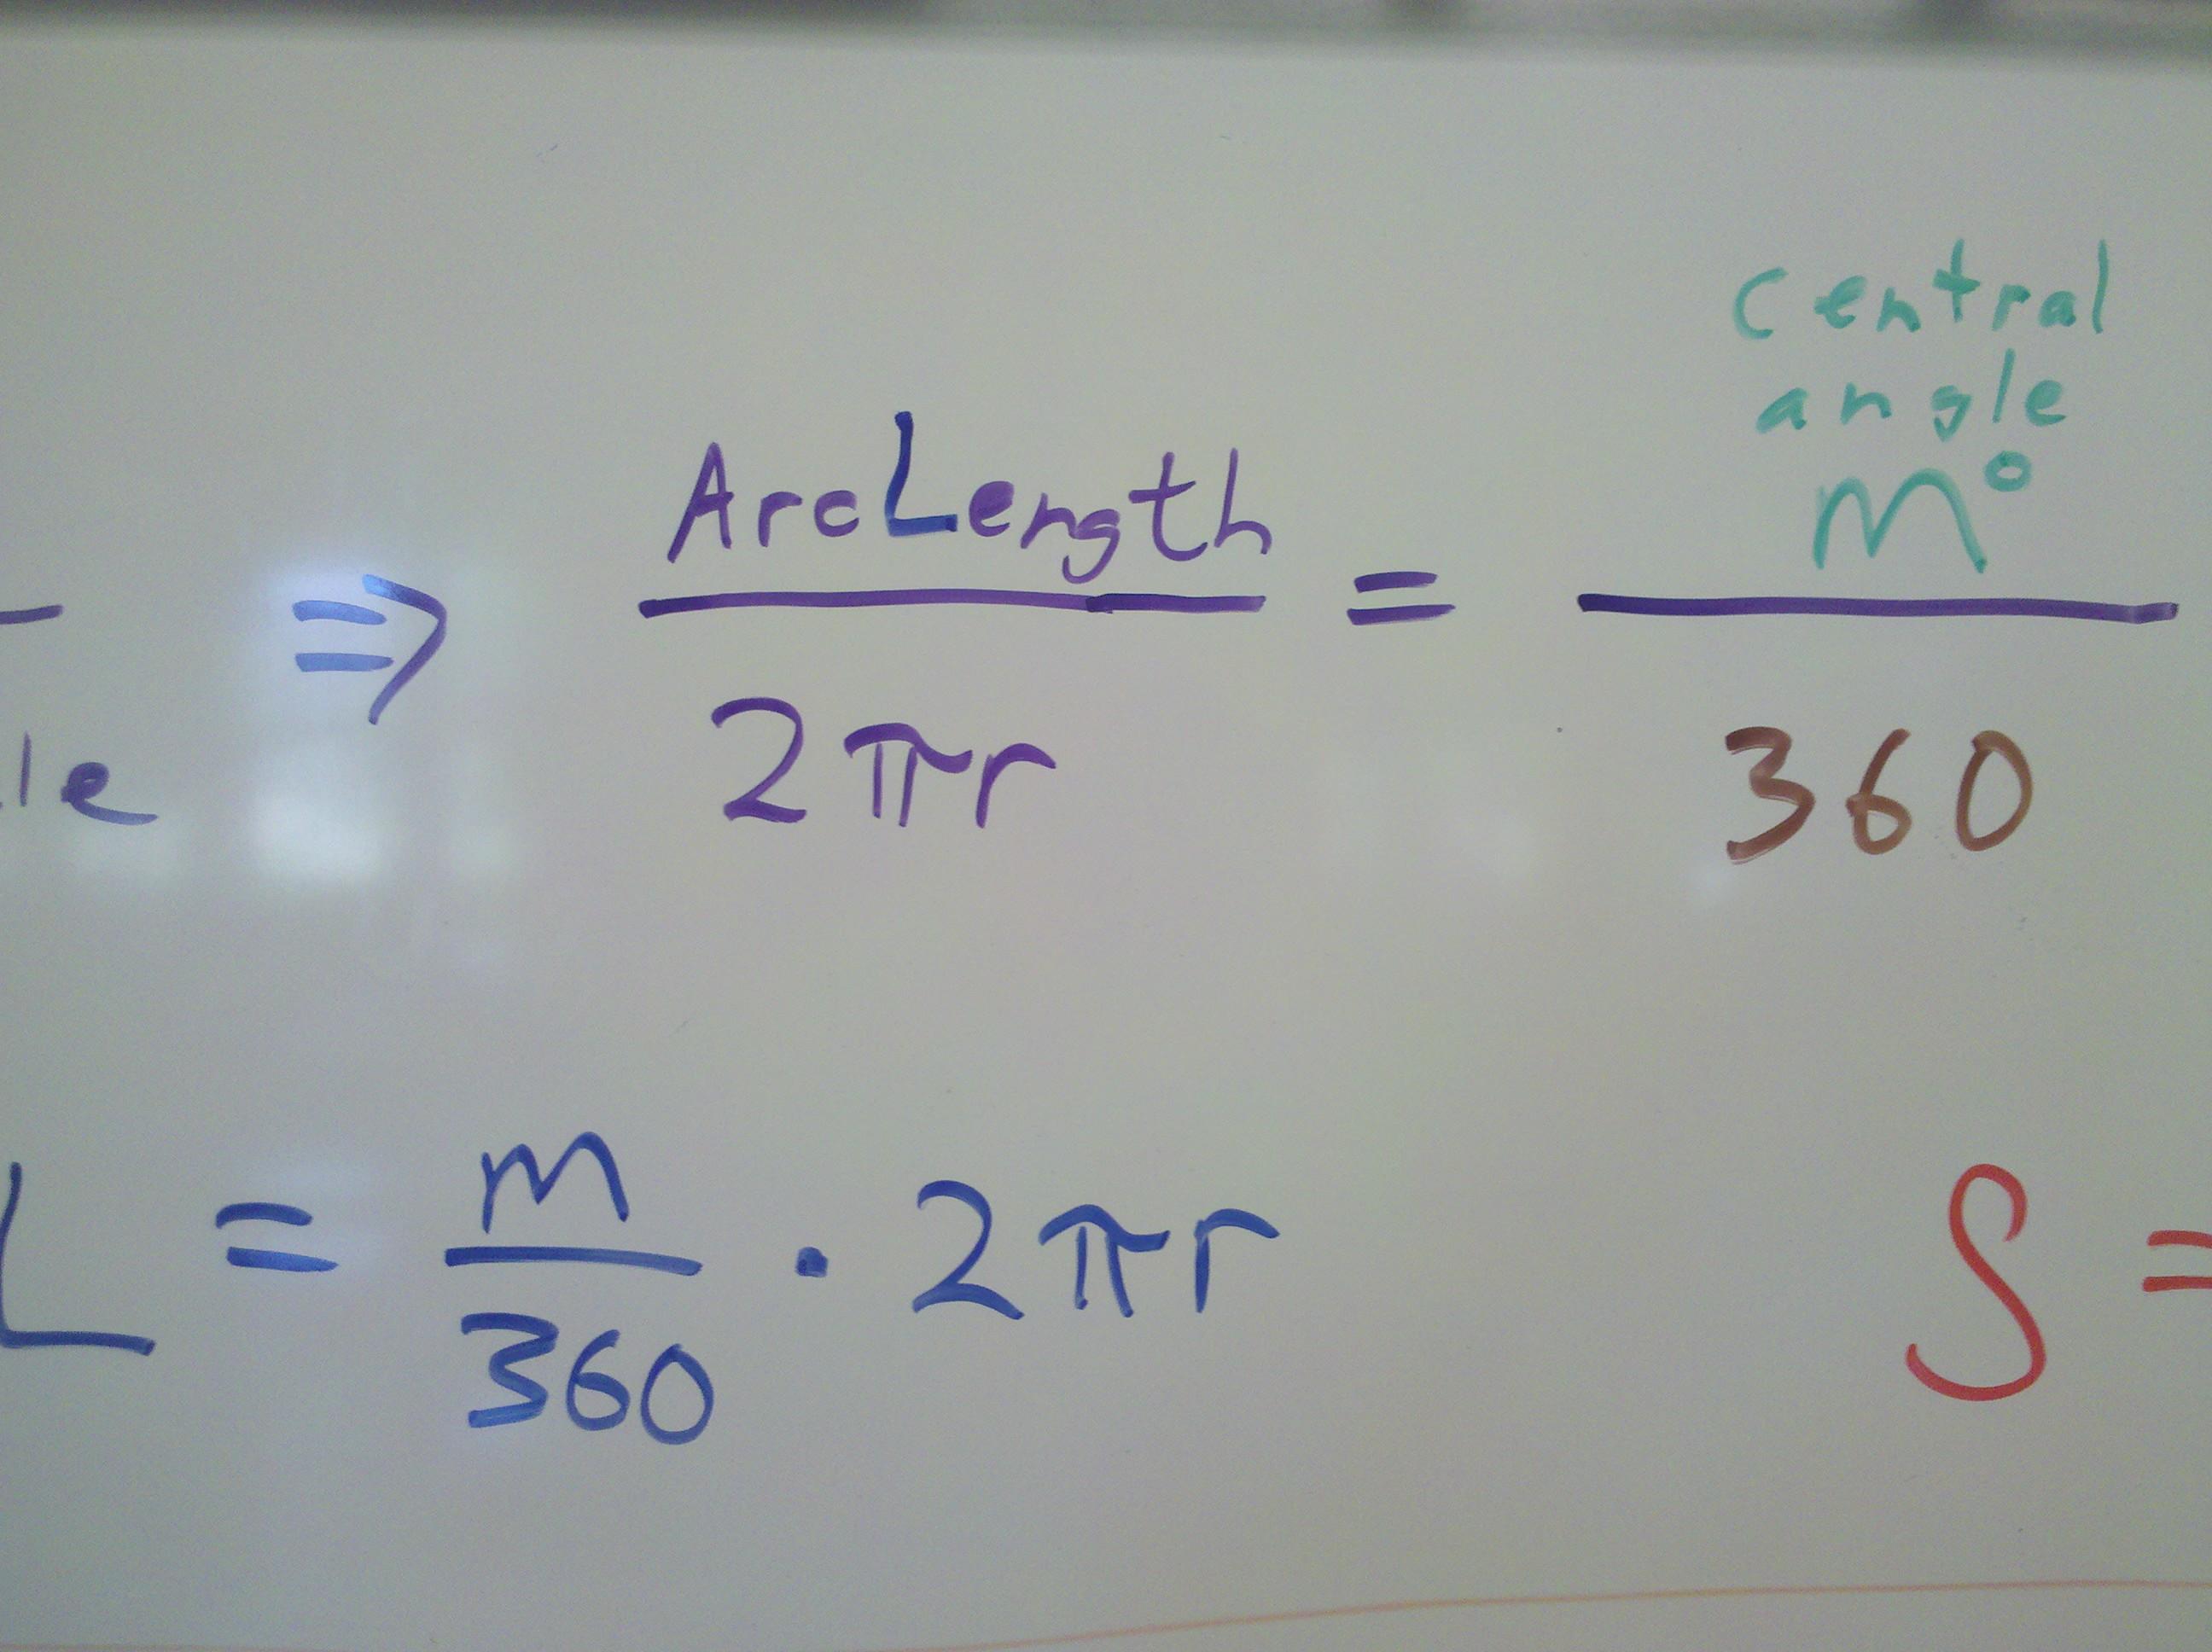 arclength